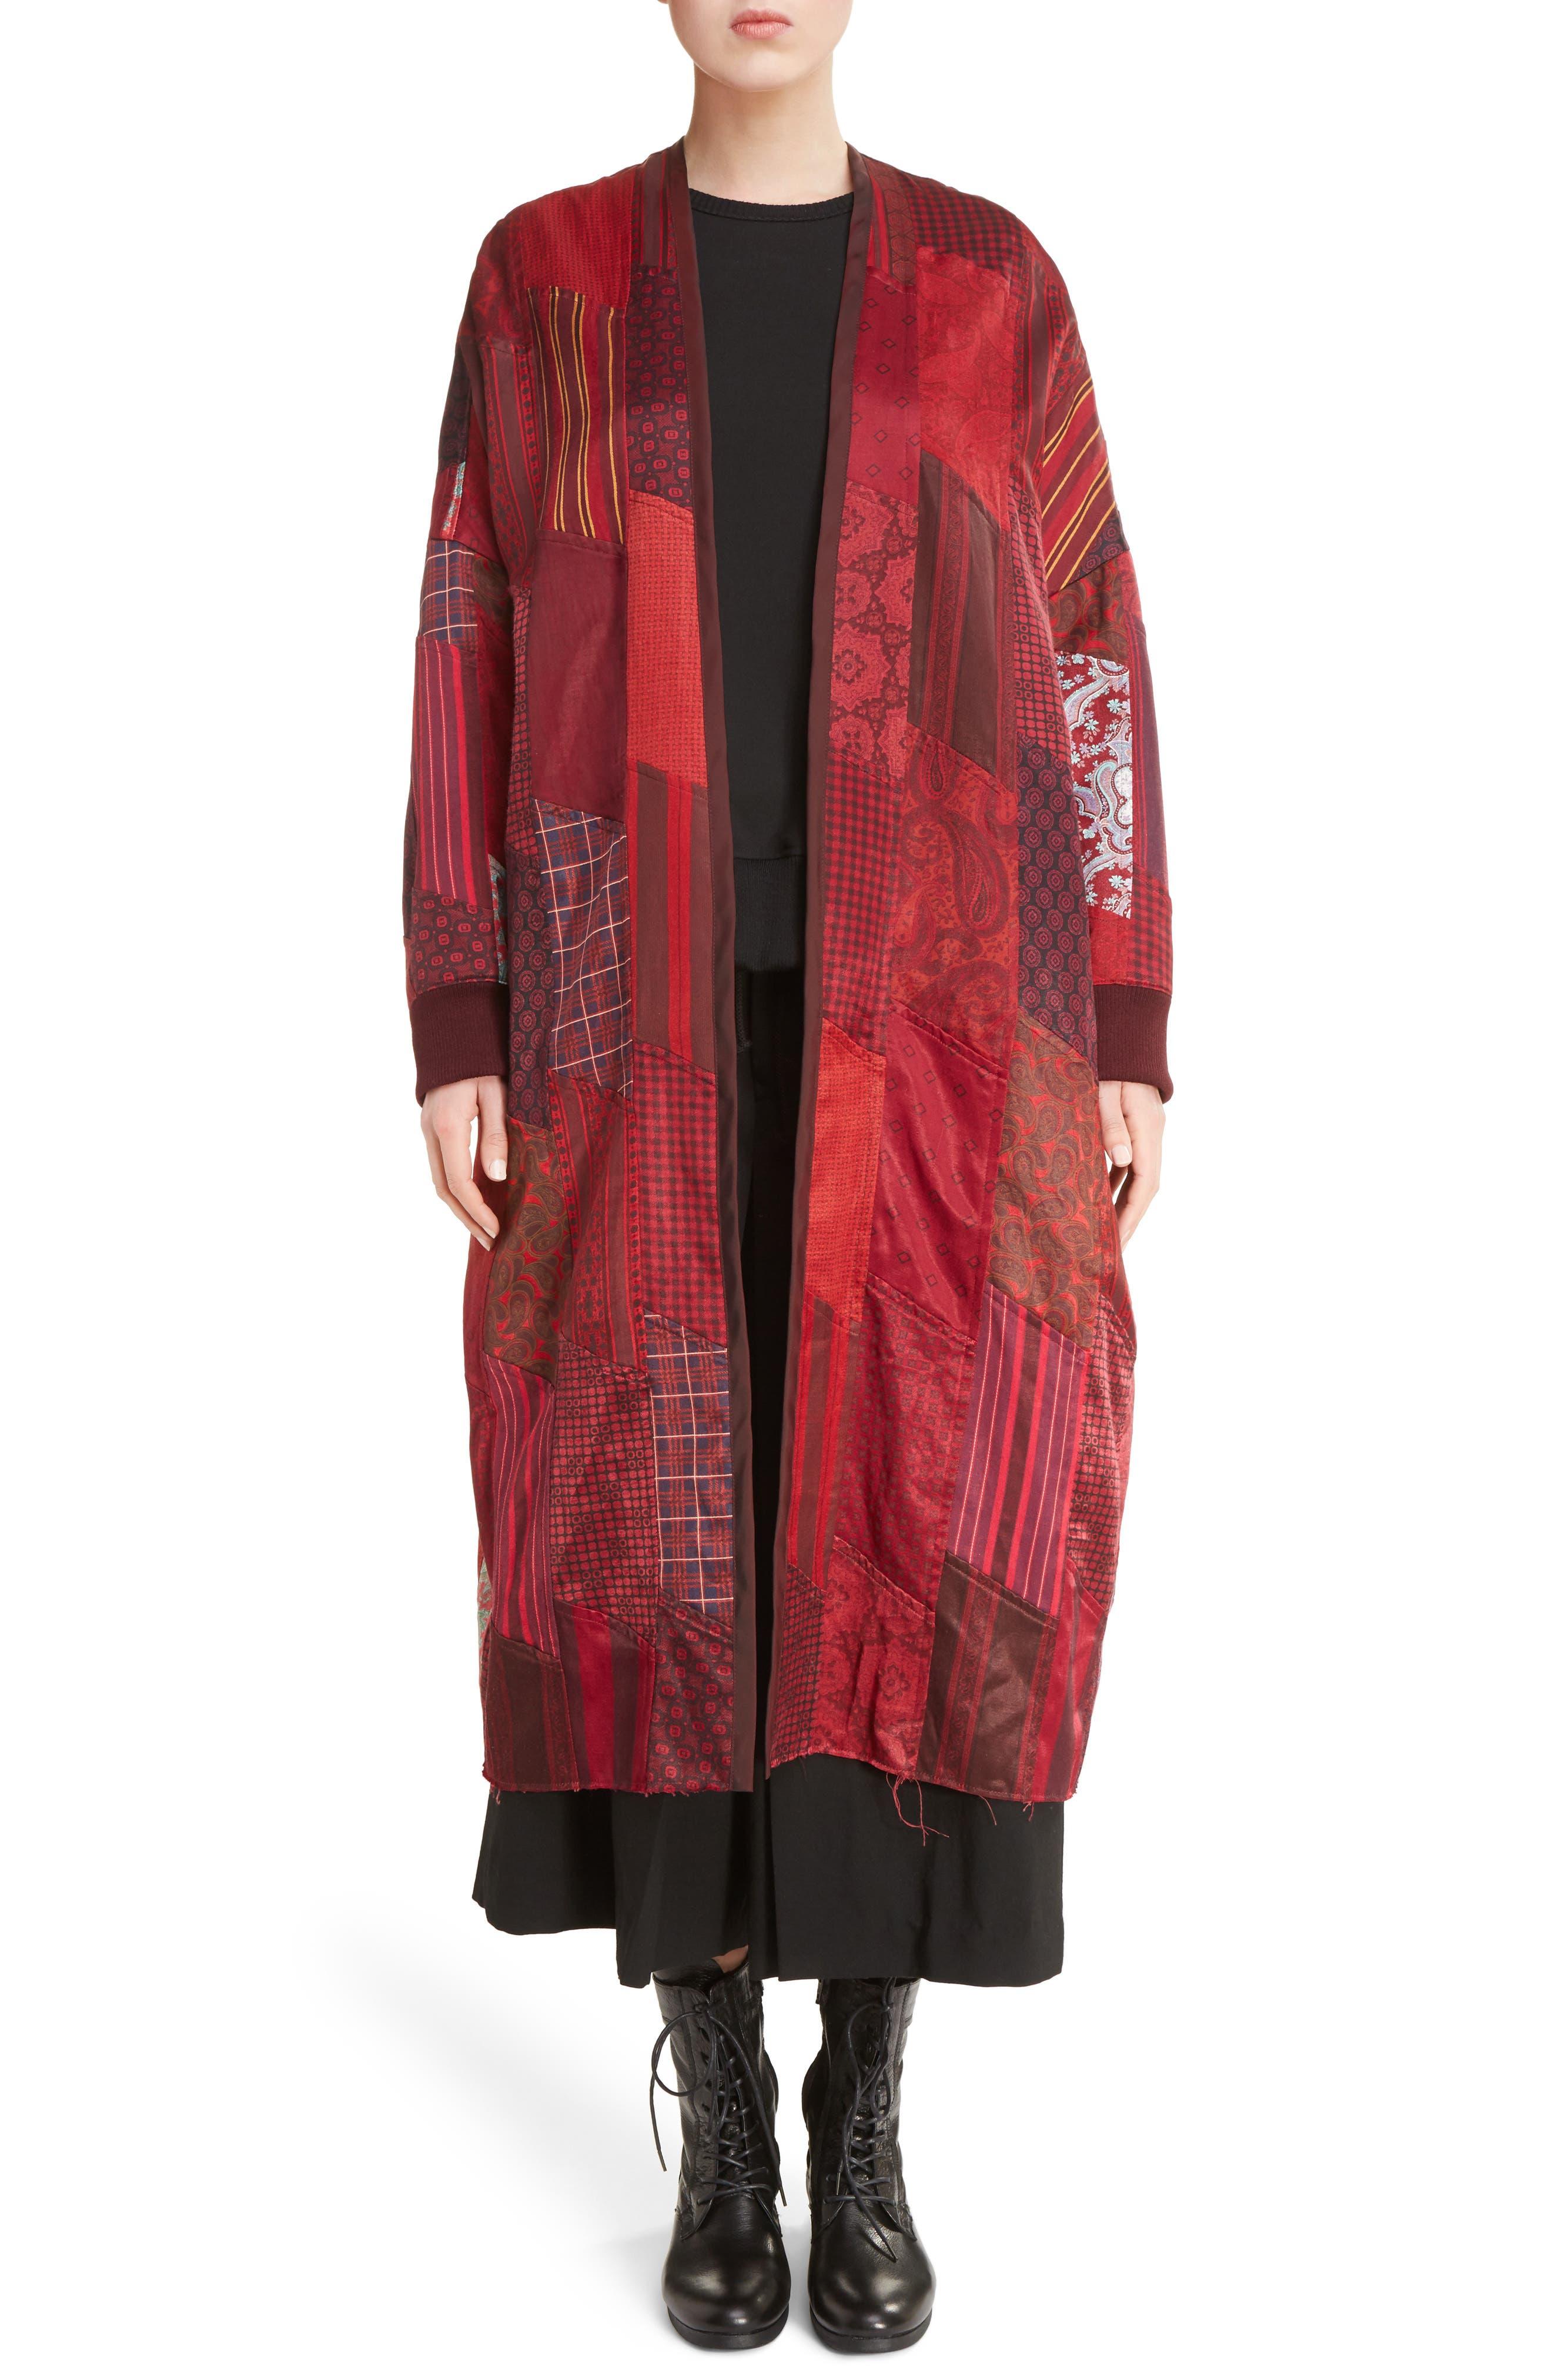 Y's by Yohji Yamamoto K Collarless Patchwork Coat